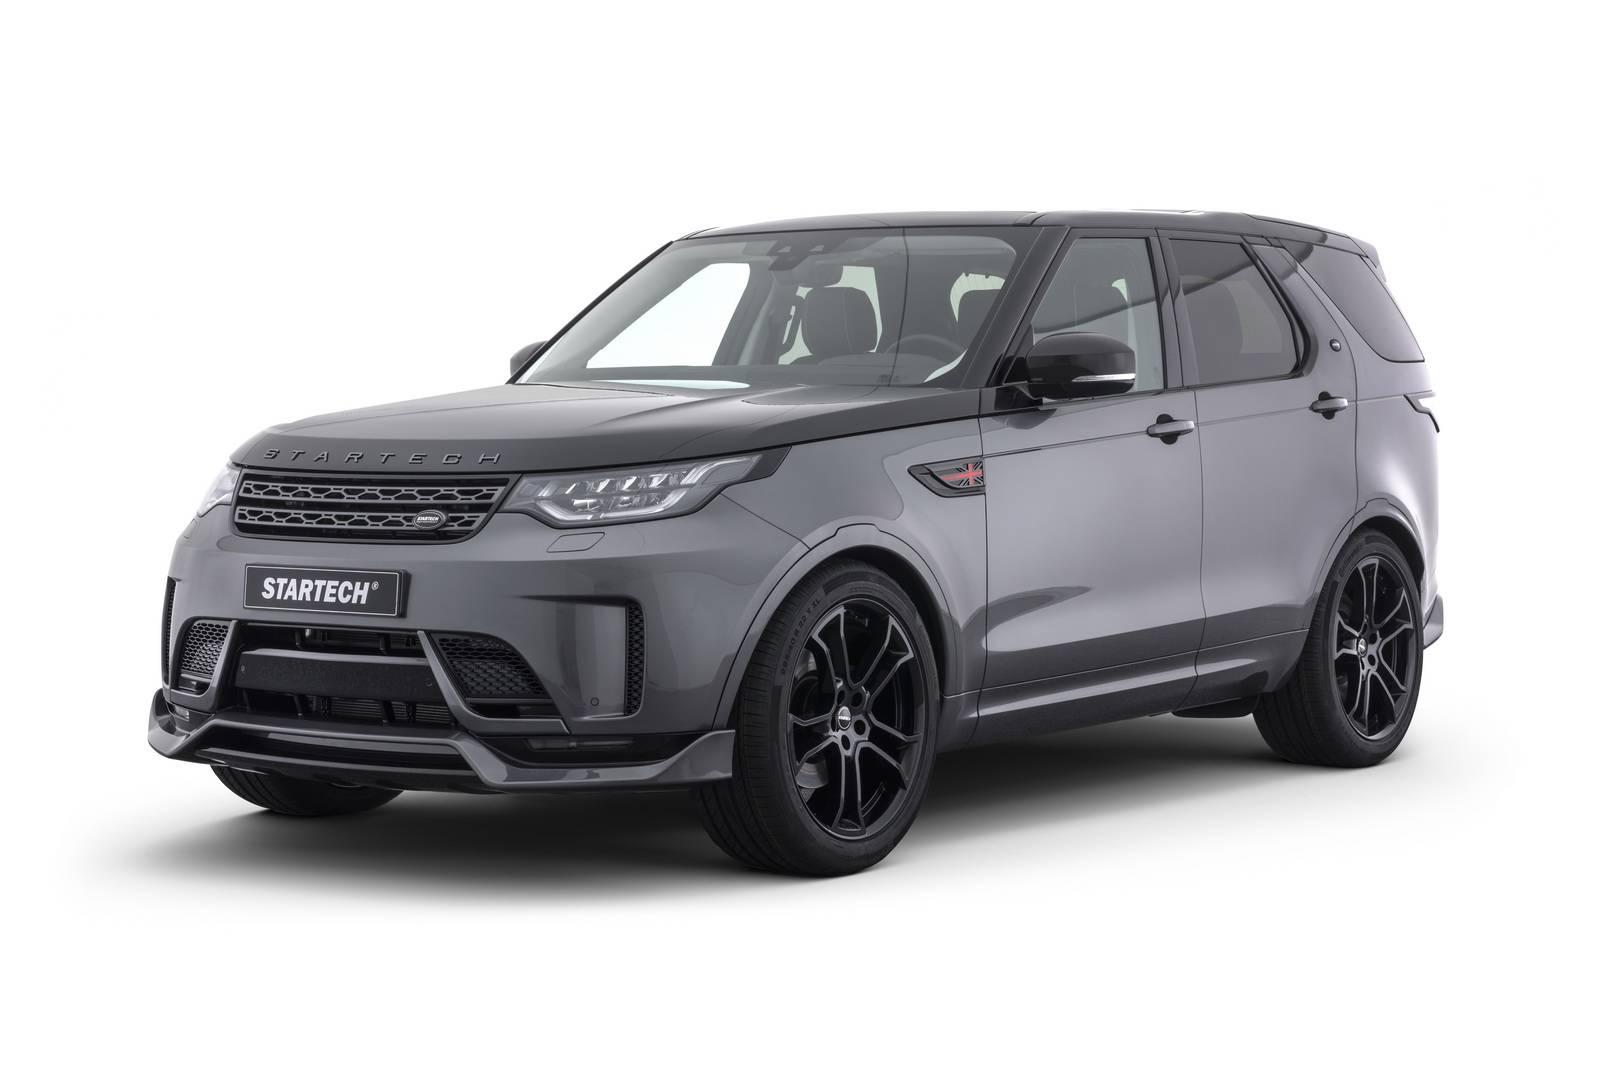 Official Startech Land Rover Discovery Gtspirit